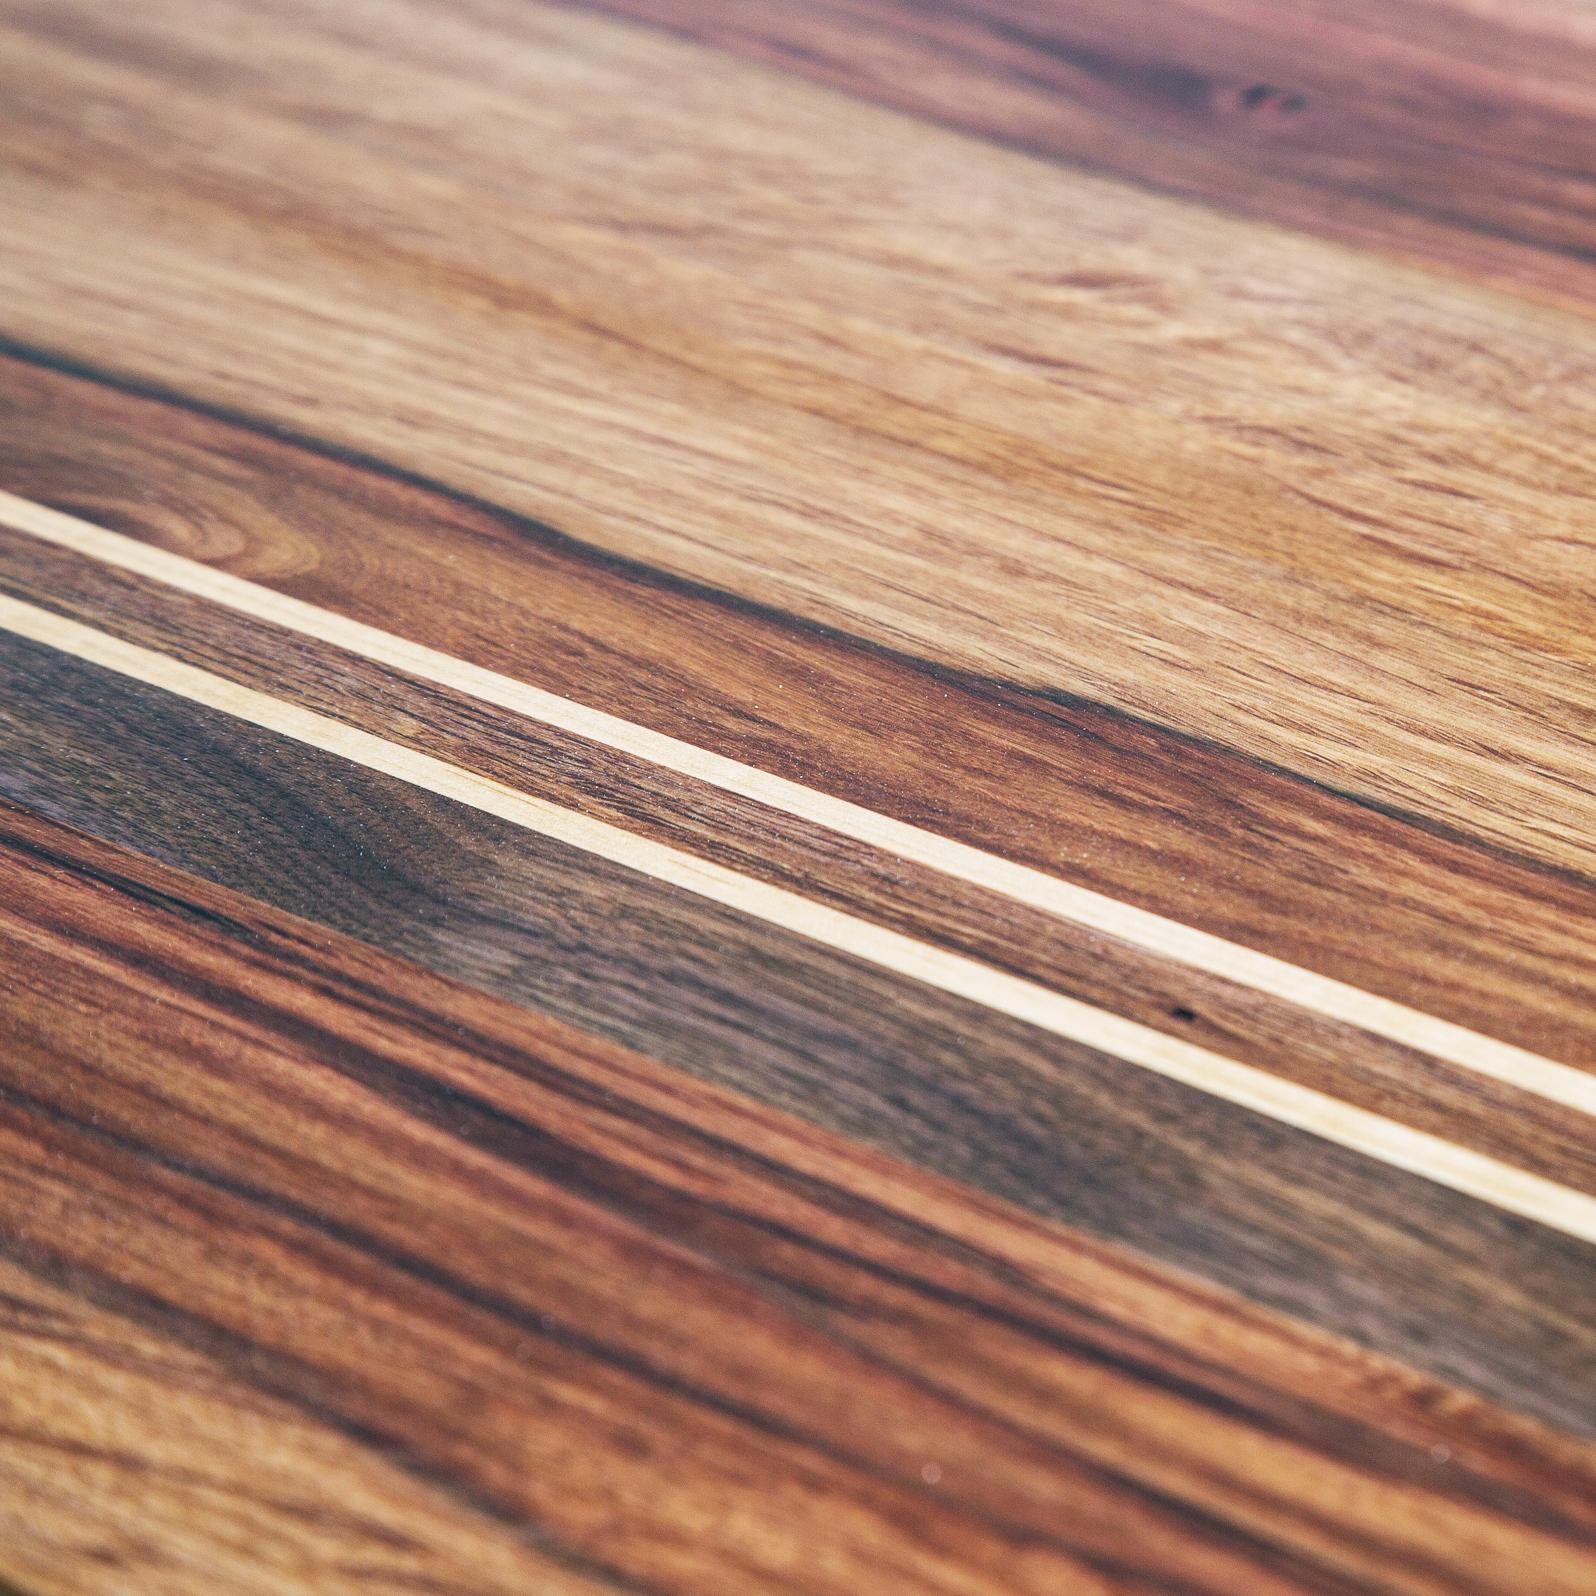 WoodStreetStudio_WoodGrain2.jpg